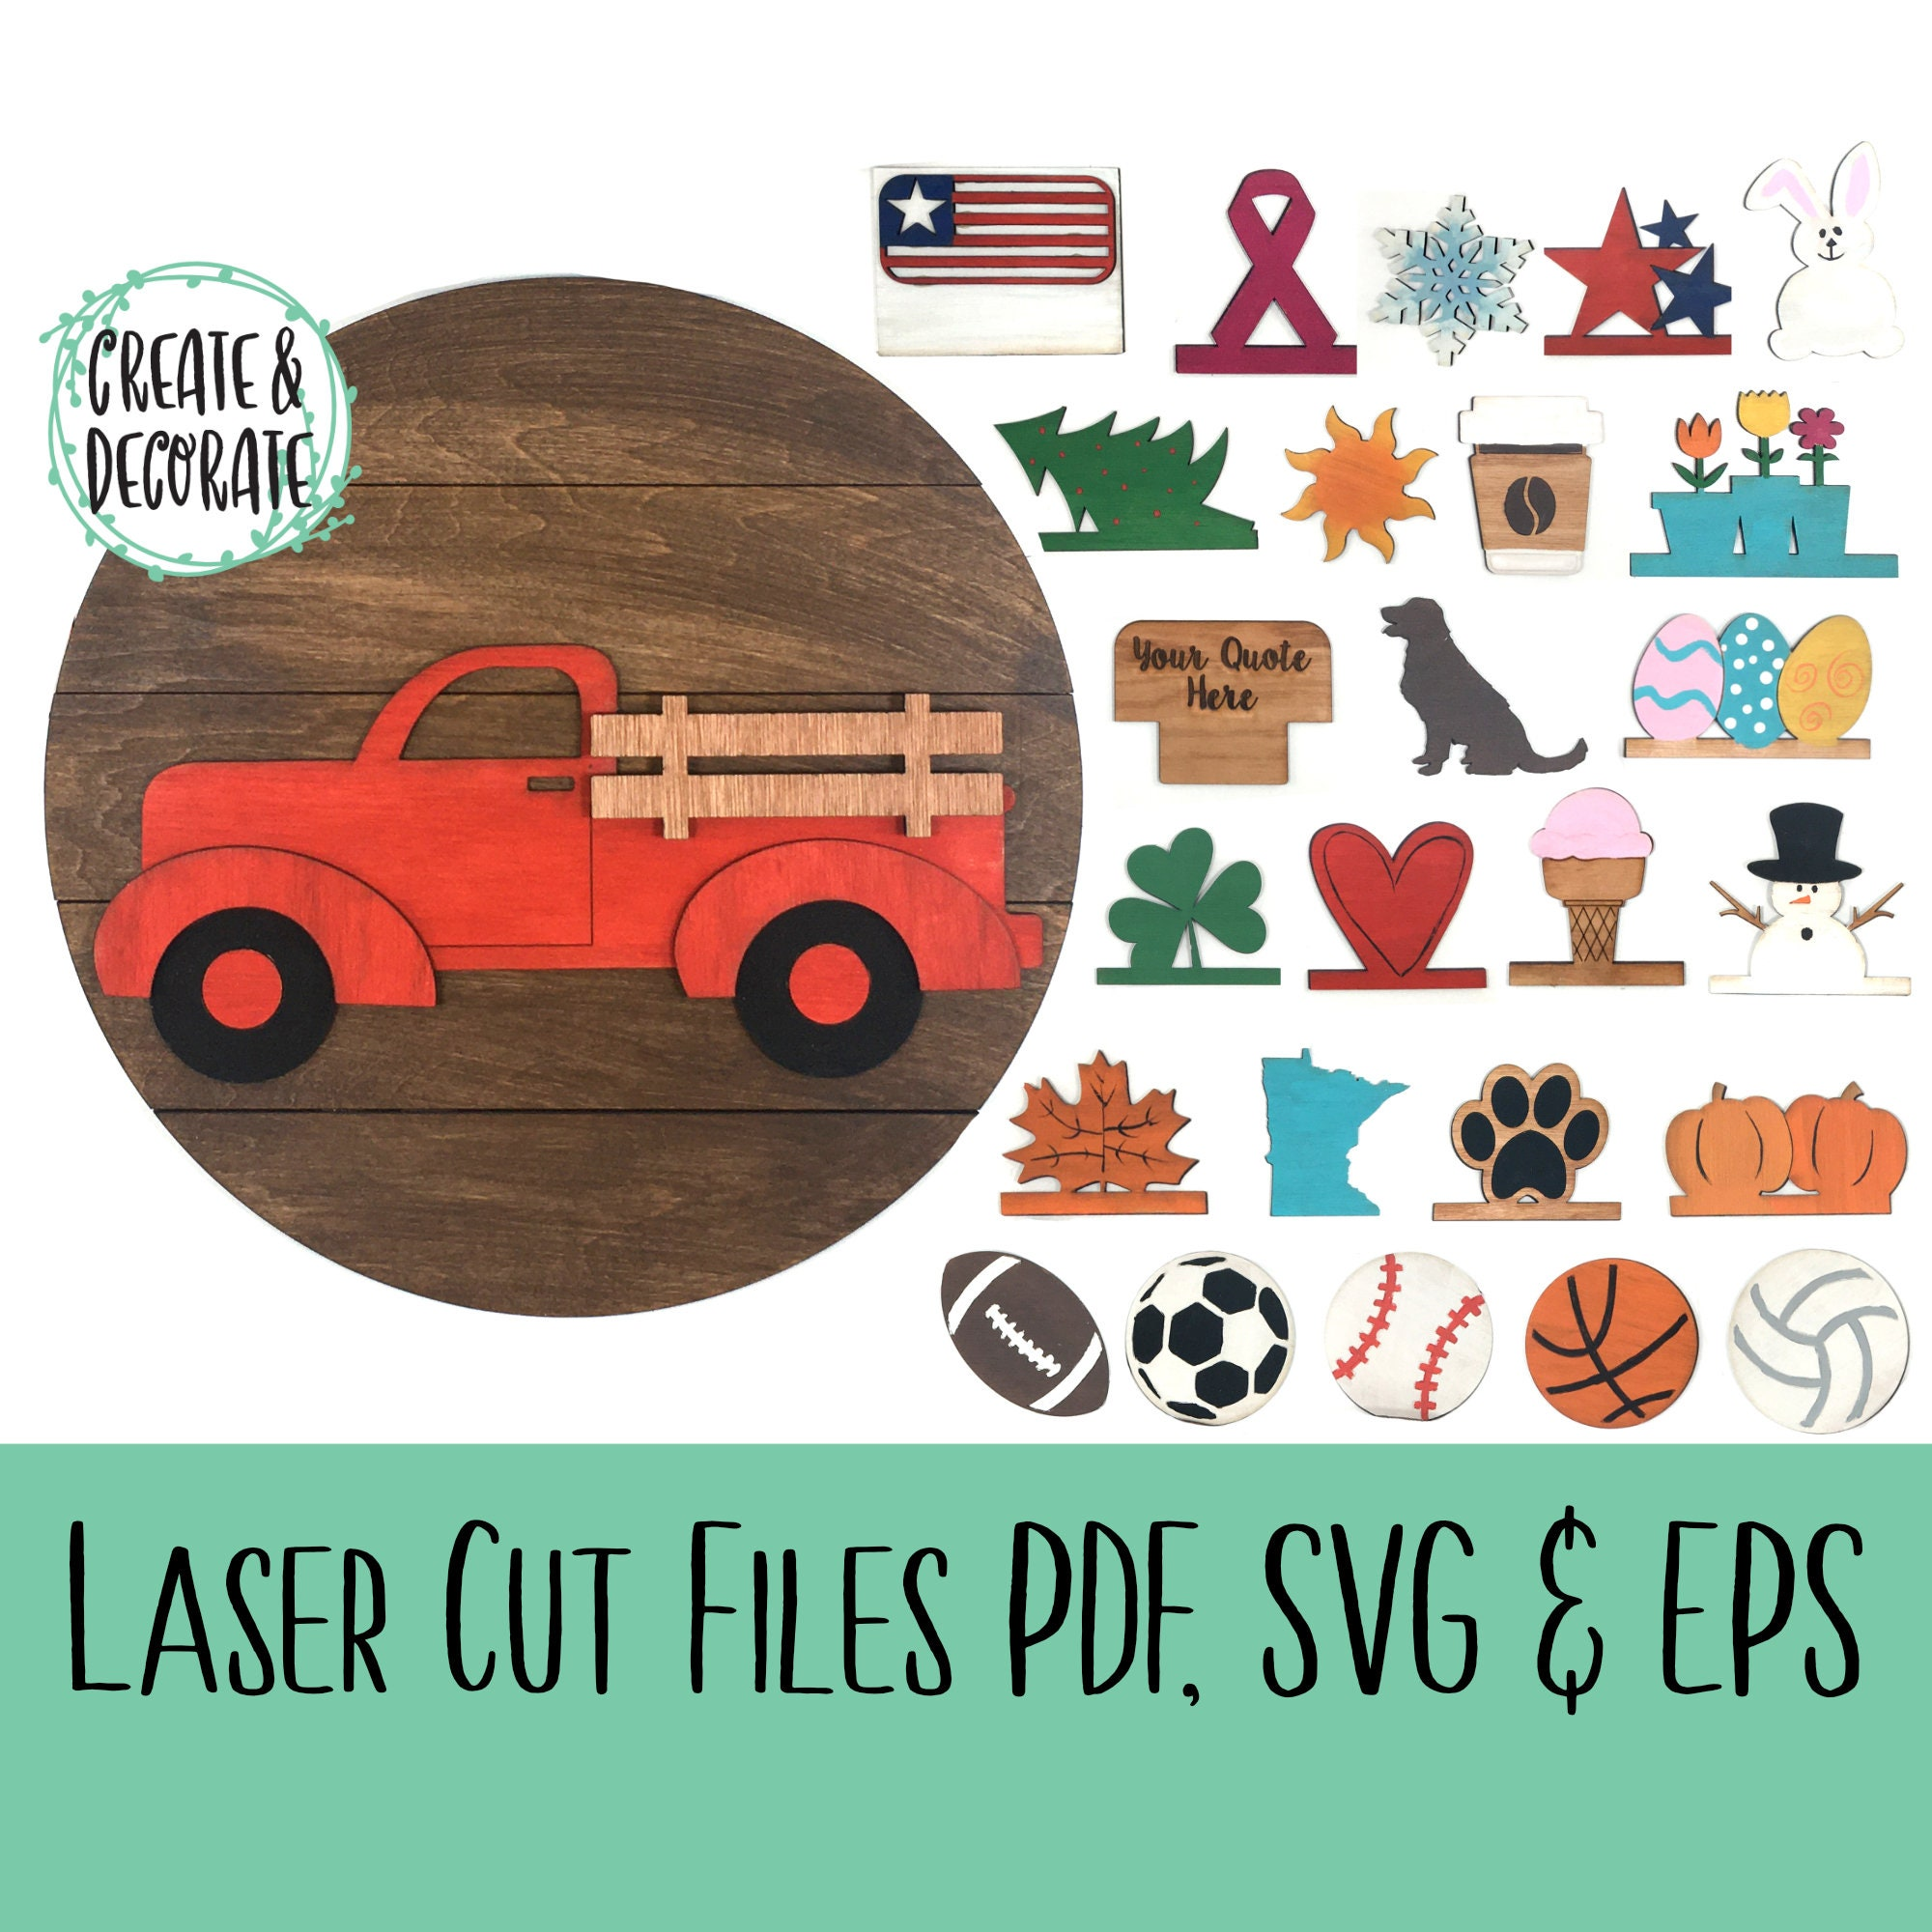 Truck SVG Interchangeable truck SVG Cut File for Glowforge Glowforge Svg- Glow Forge seasons Svg- SVG Glowforge File